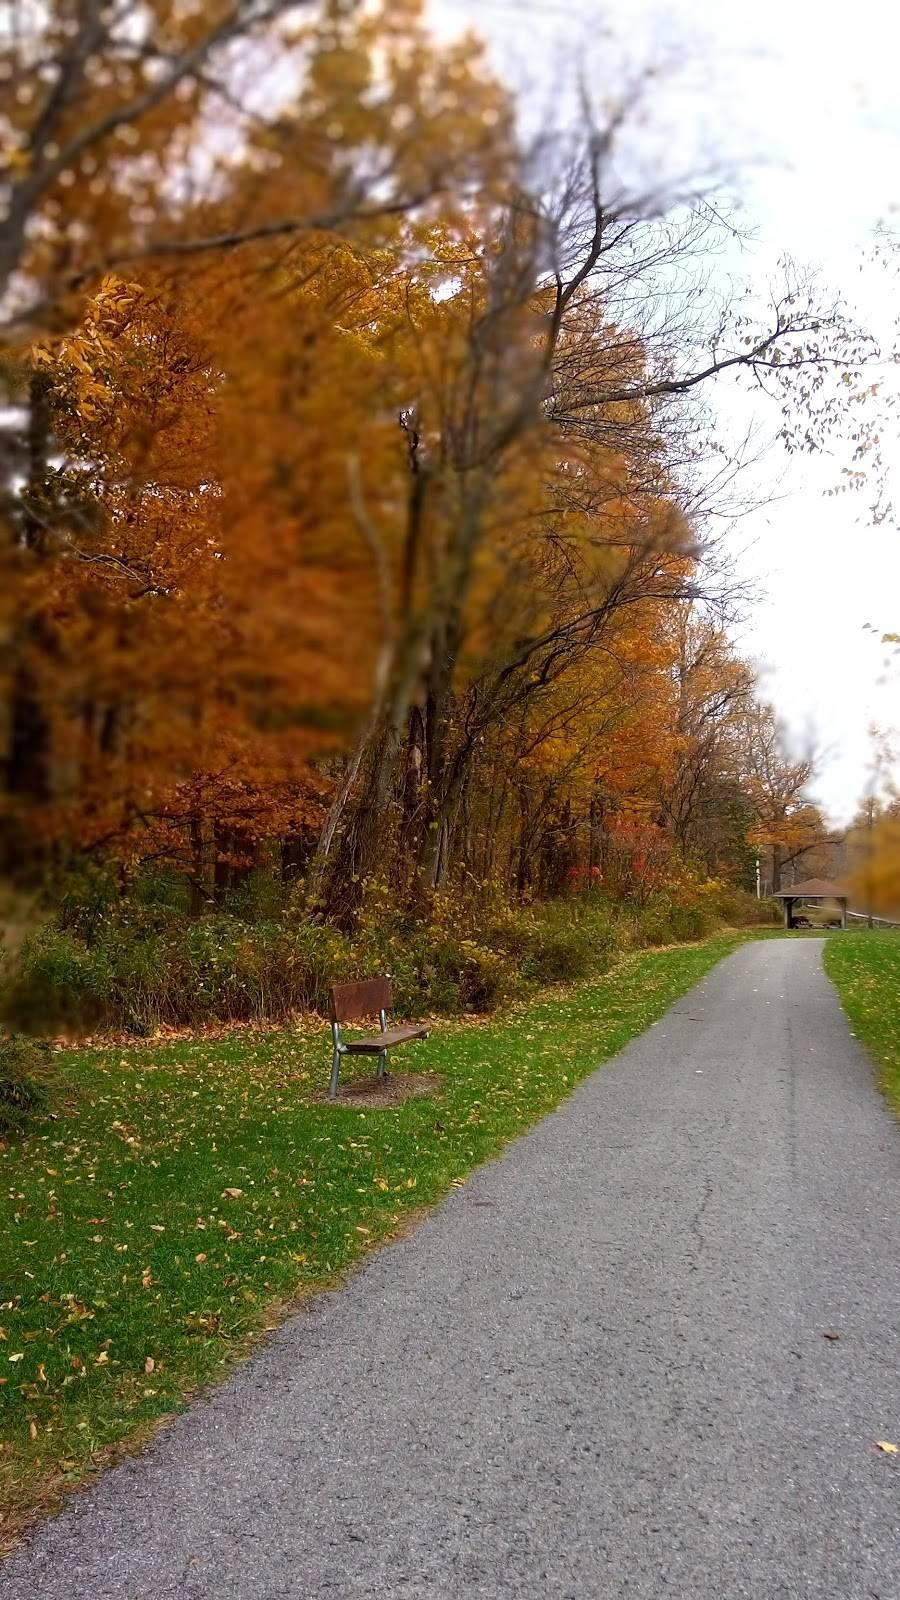 Elma Town Green - park  | Photo 3 of 3 | Address: Bowen Rd, Elma, NY 14059, USA | Phone: (716) 651-4619